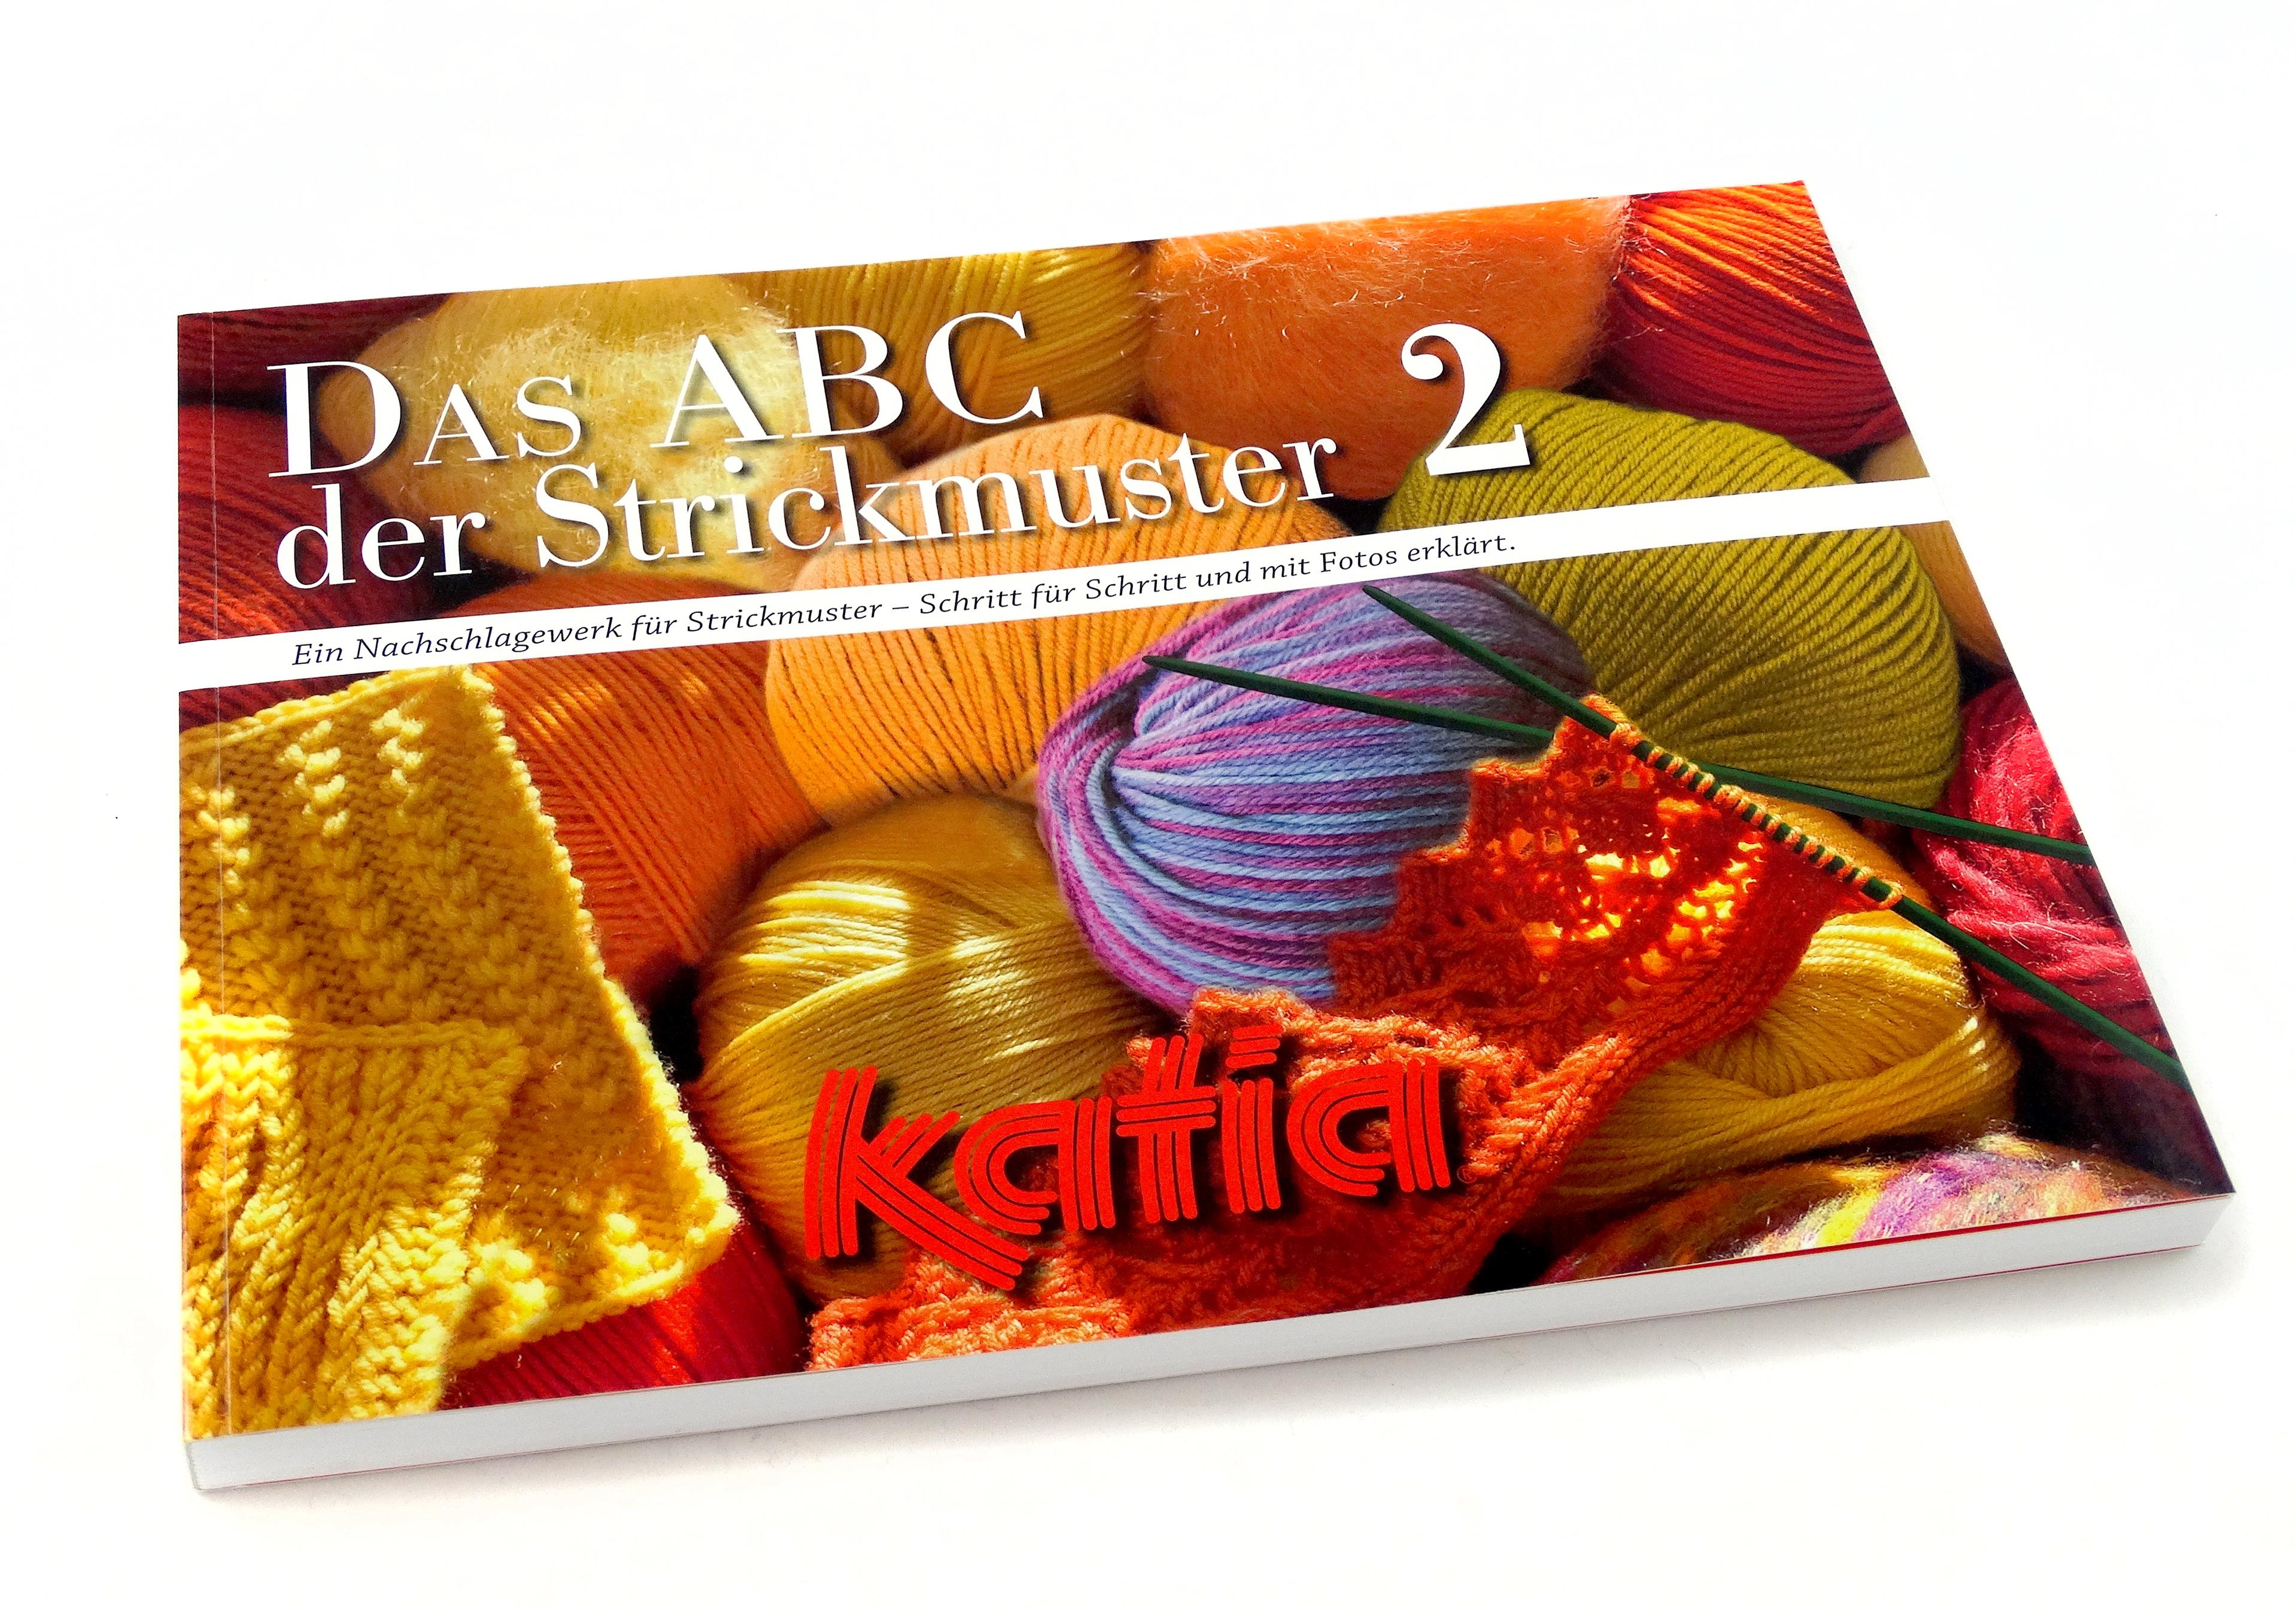 Das ABC der Häkelmuster Archivos - Katia Garne - Blog